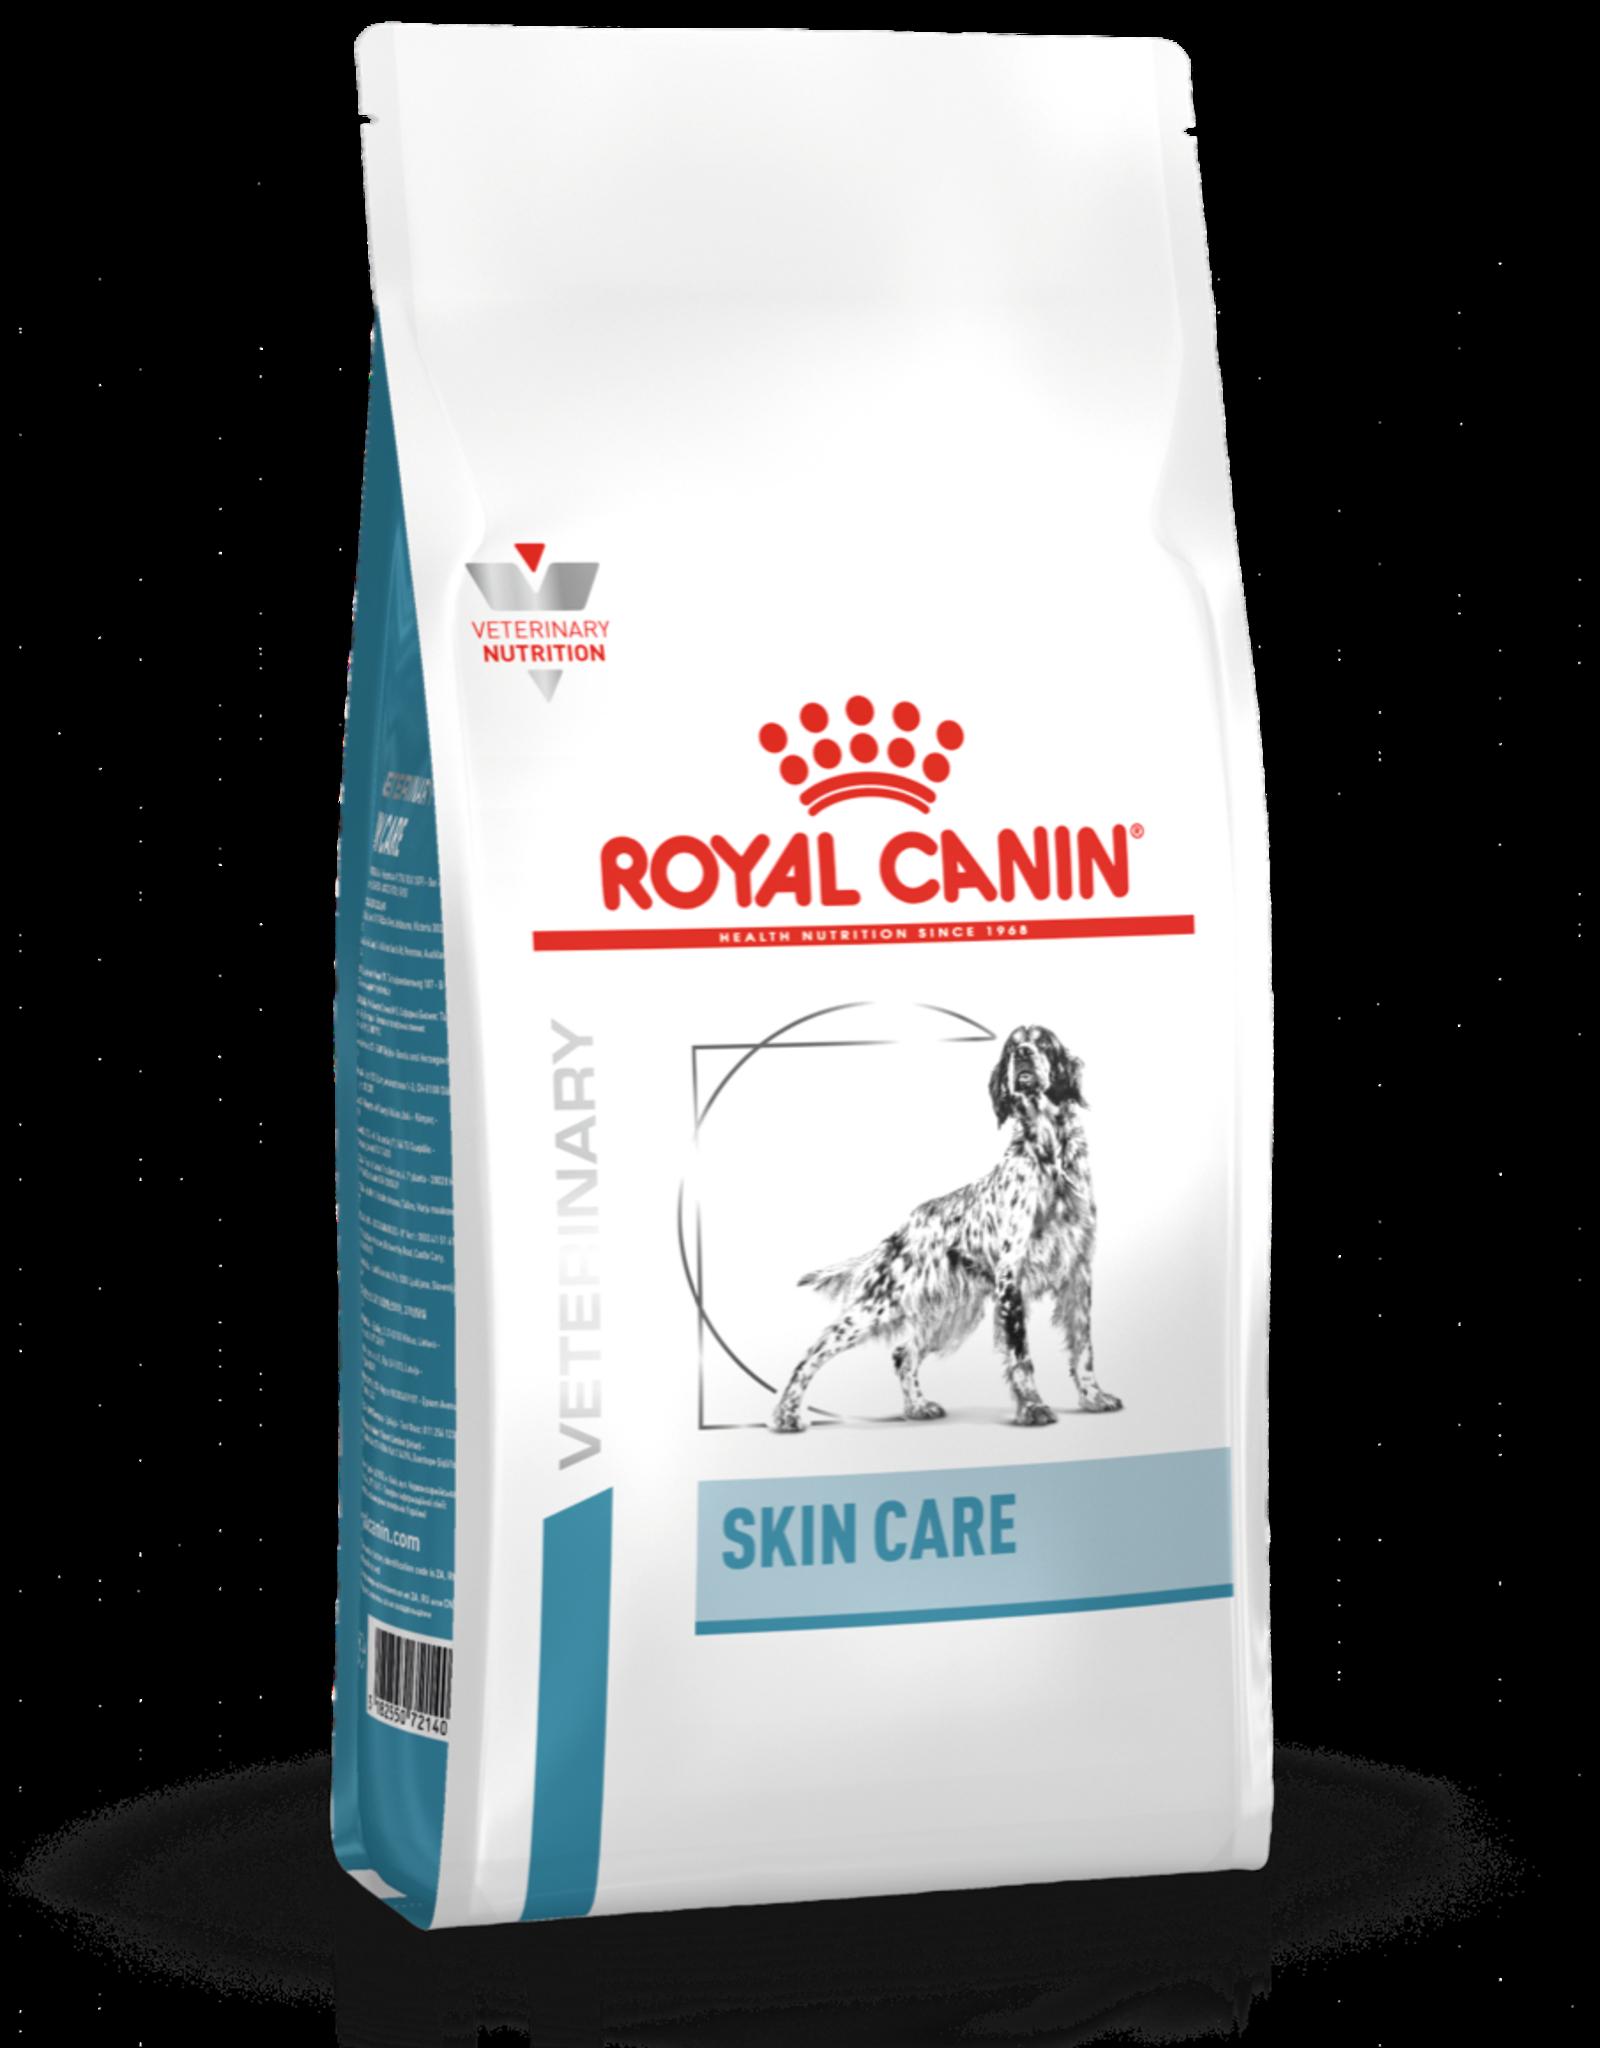 Royal Canin Royal Canin Skin Care Chien 11kg